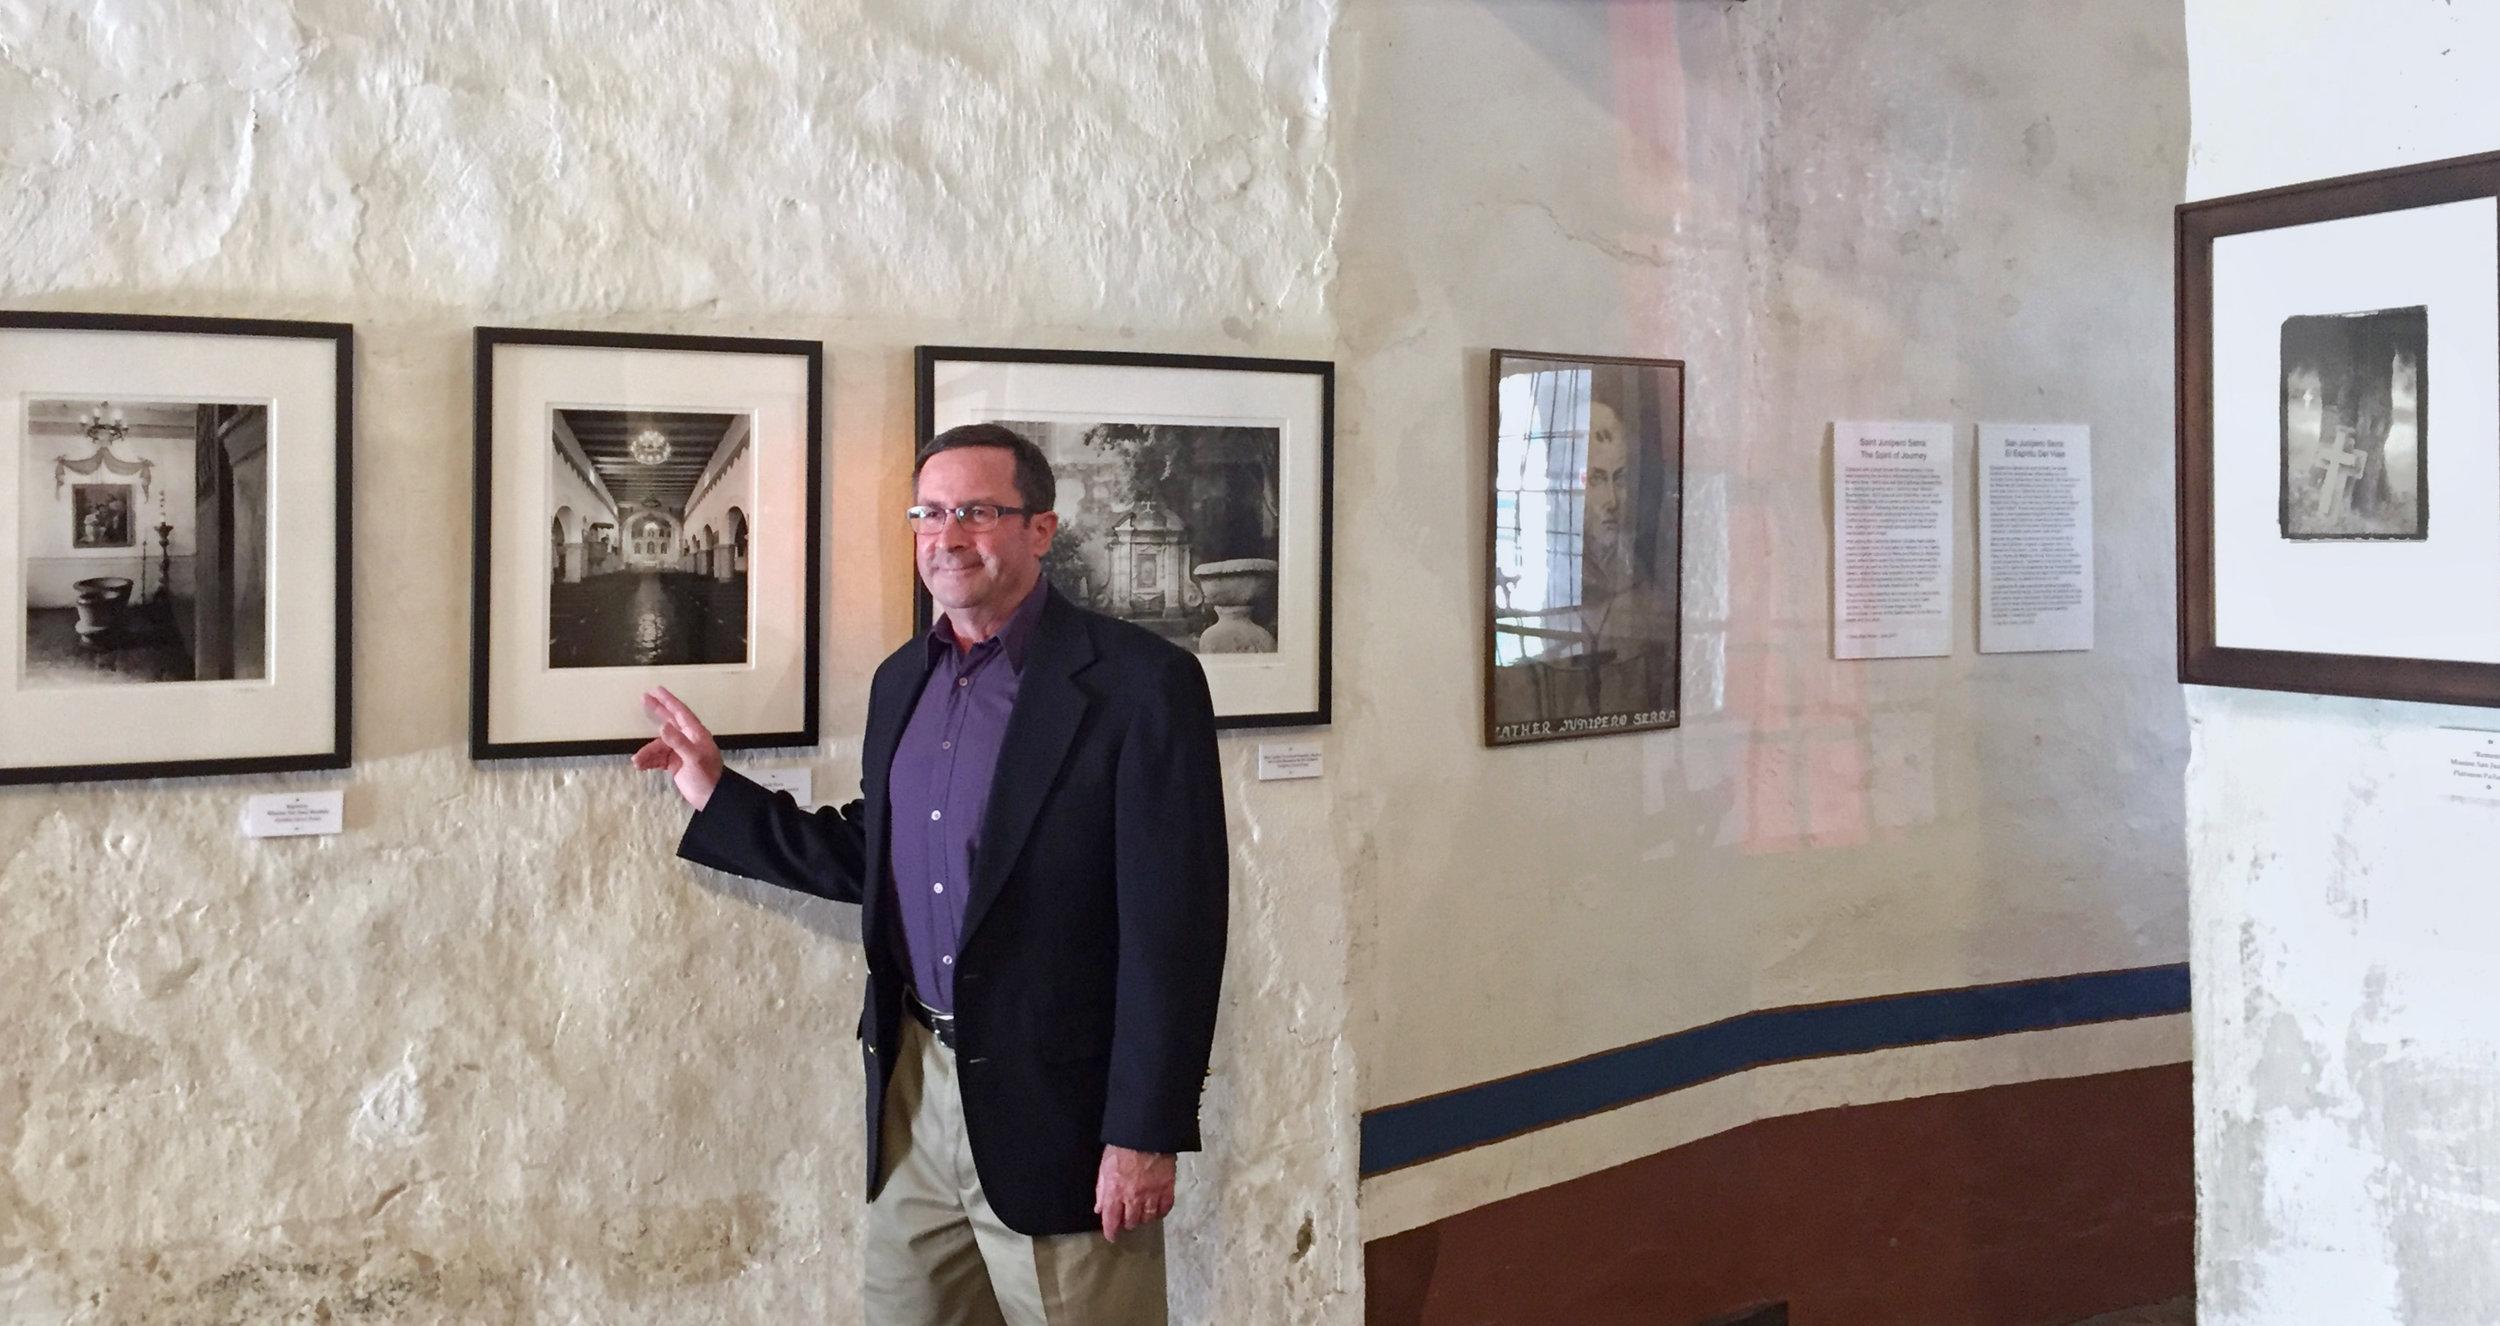 Craig Alan Huber, Mission San Juan Bautista